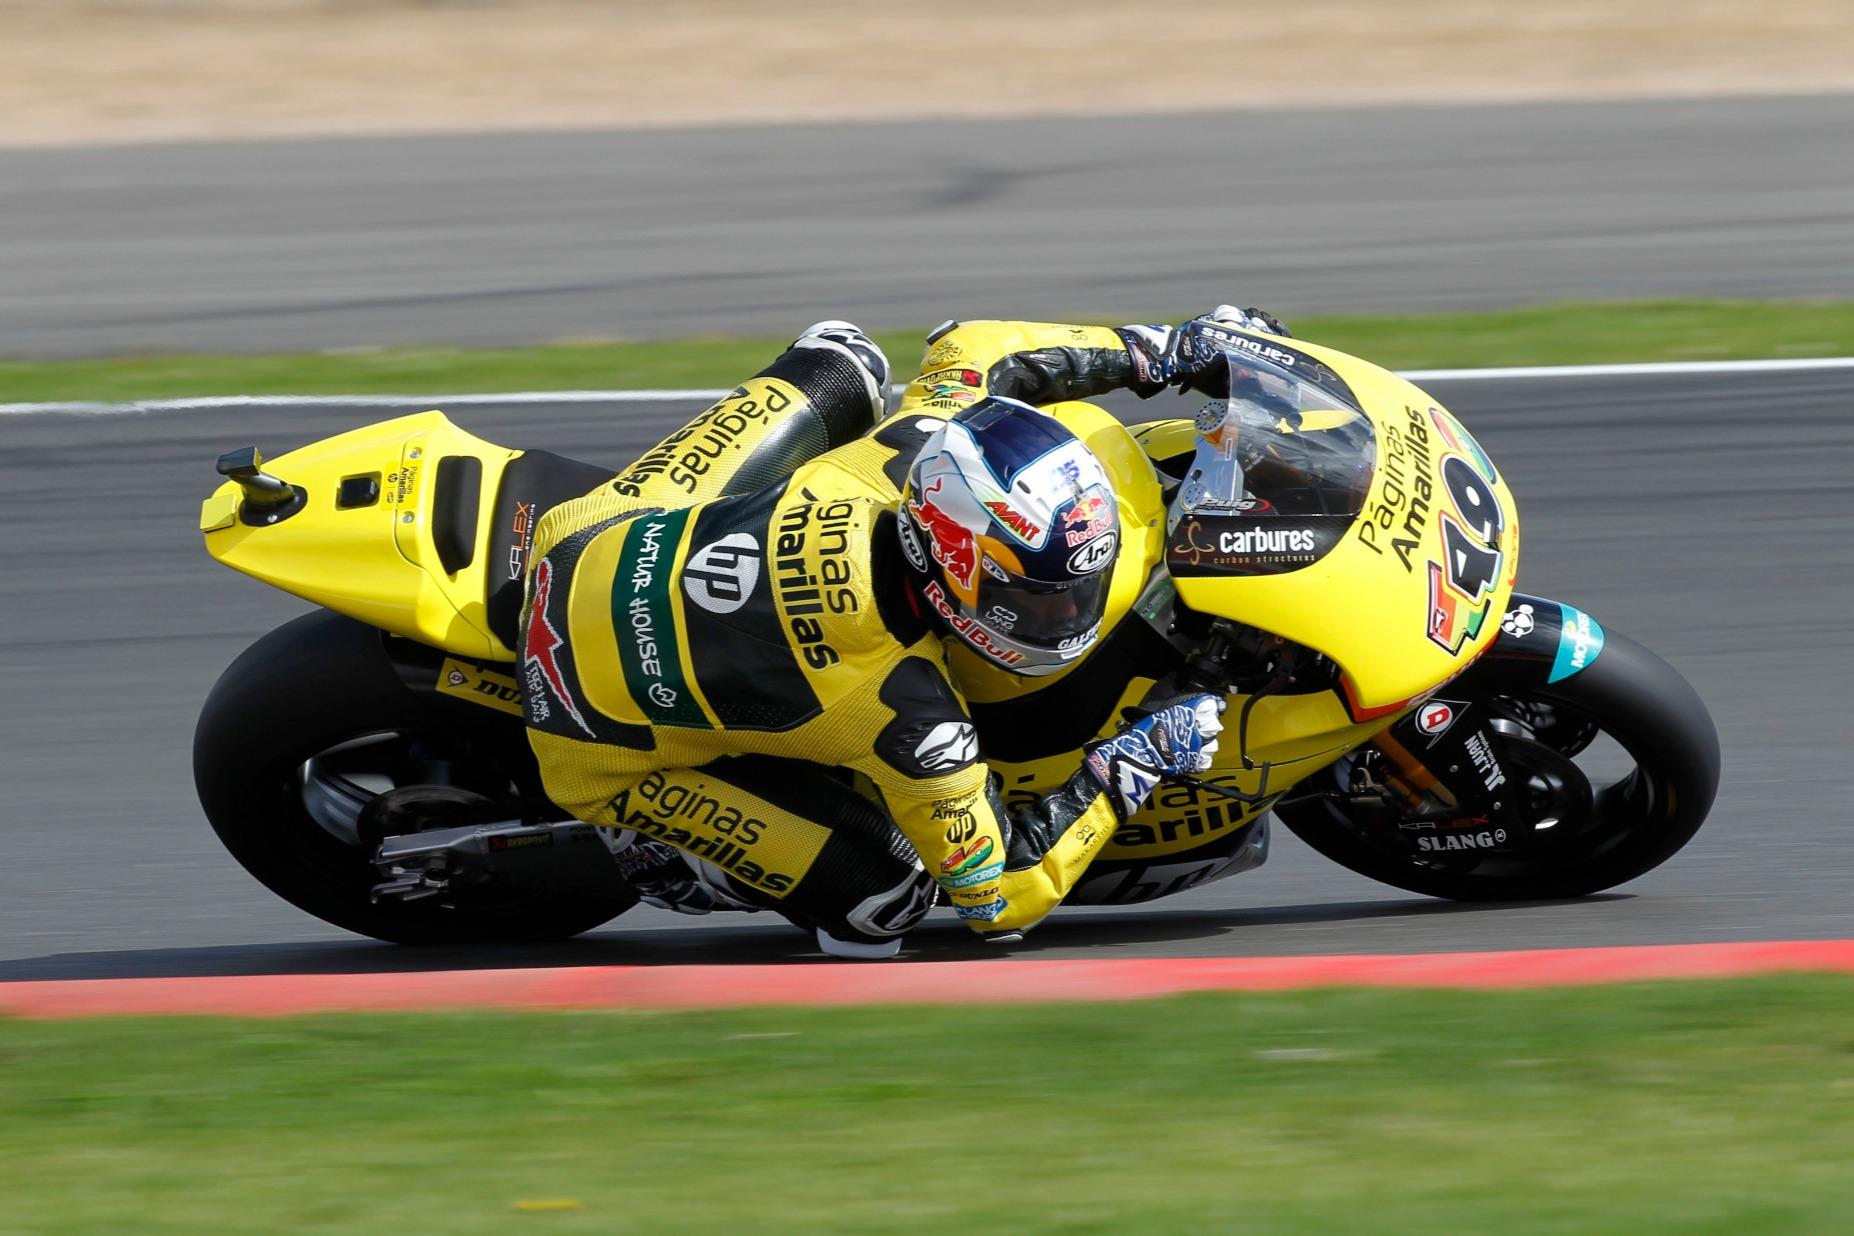 Maverick Vinales, 2014 Moto2 Pons